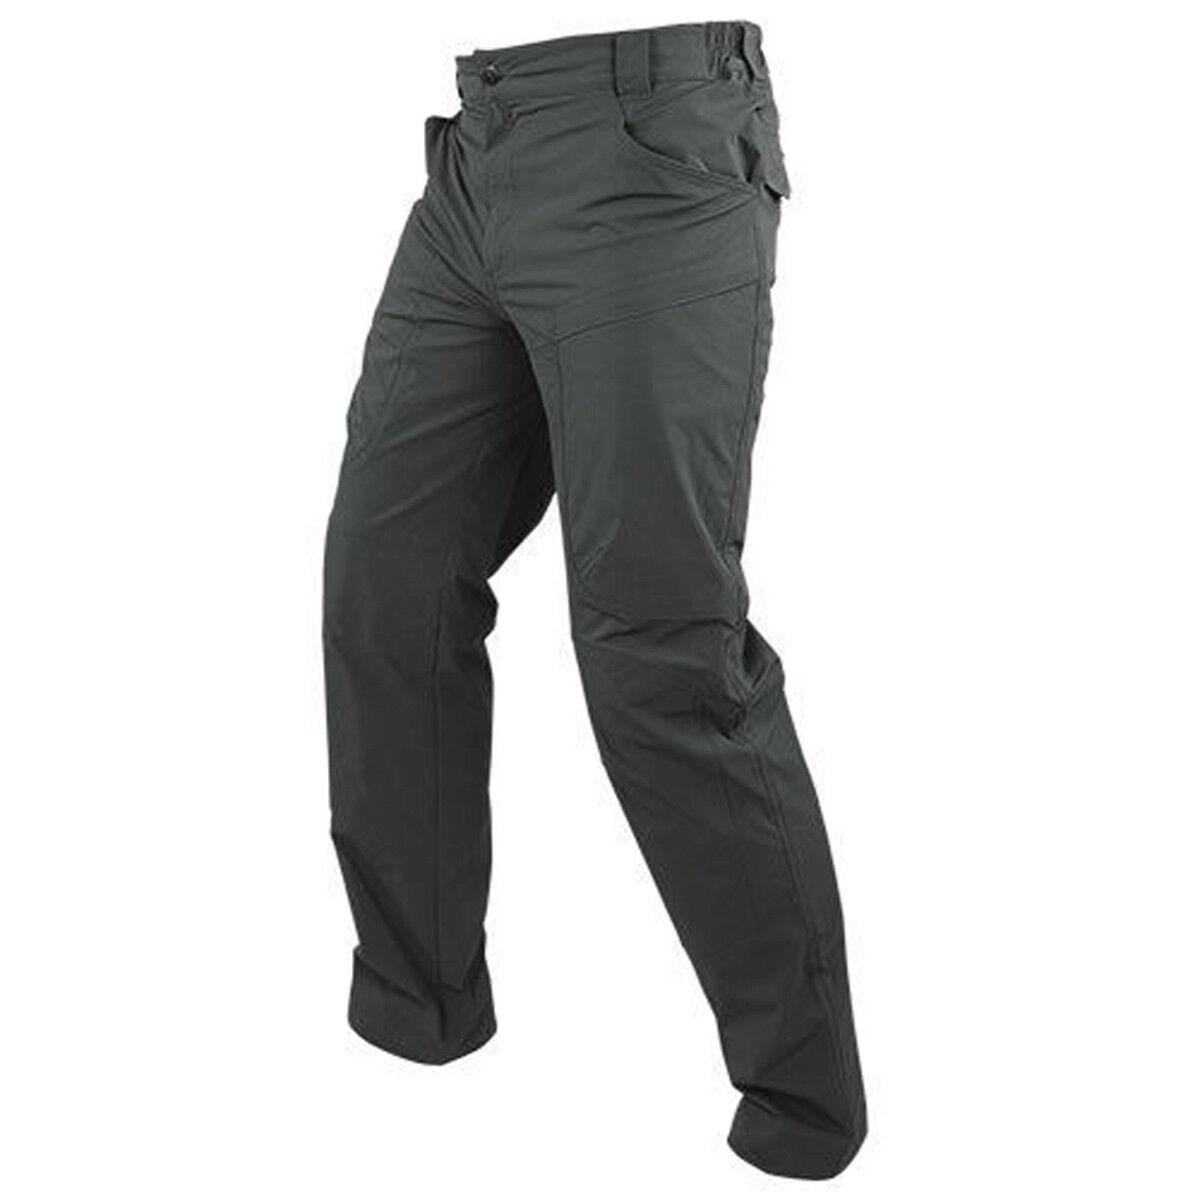 Condor Odyssey Flex Pants - Charcoal  - 36W X 30L - New - 101108-028-36-30  presenting all the latest high street fashion